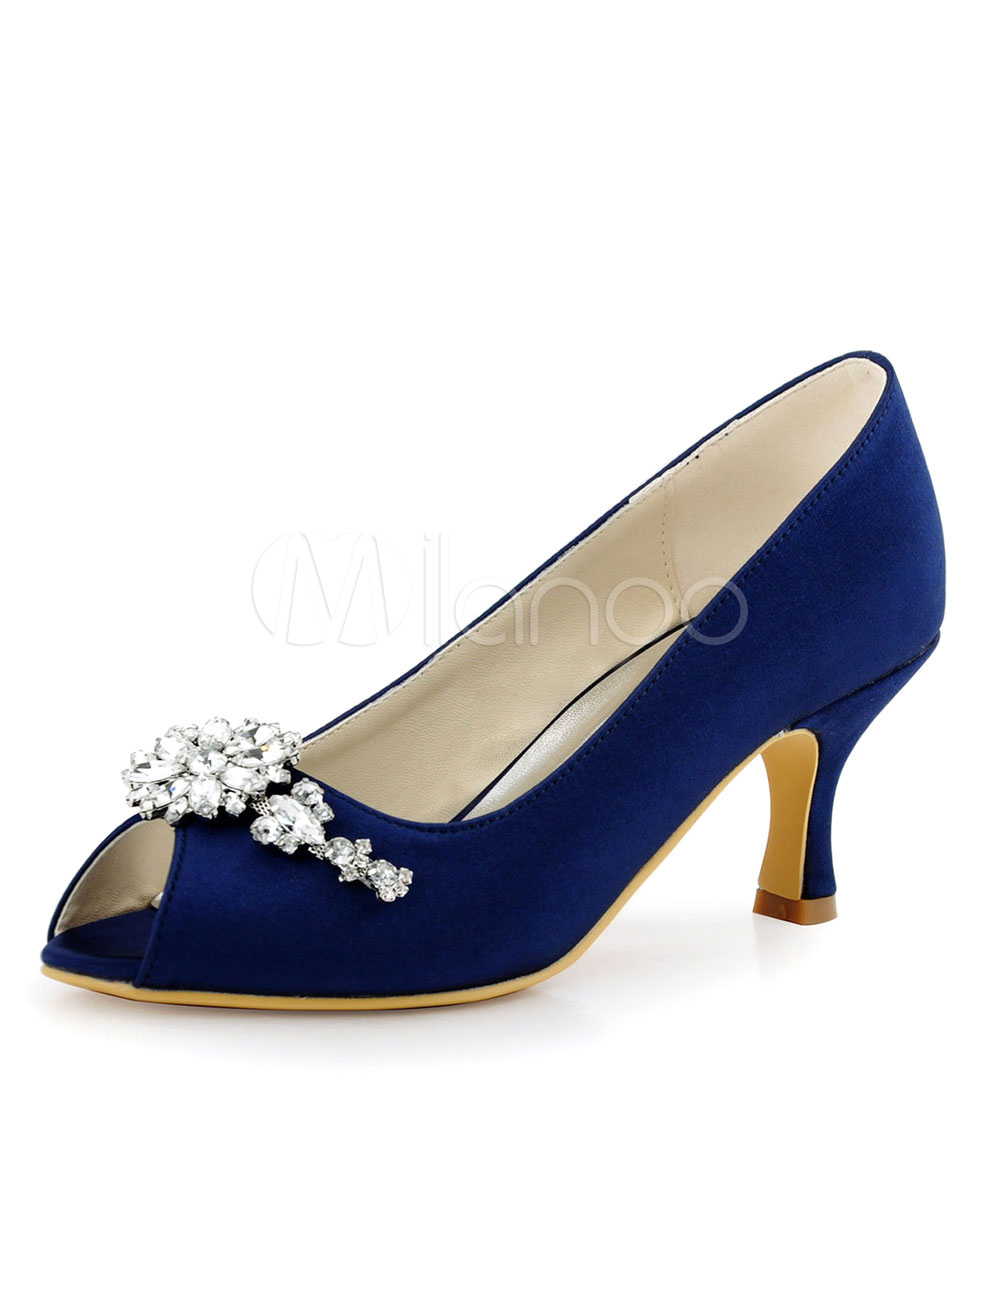 Women's Bridal Shoes Deep Blue Peep Toe Rhinestones Slip On Kitten Heel Pumps